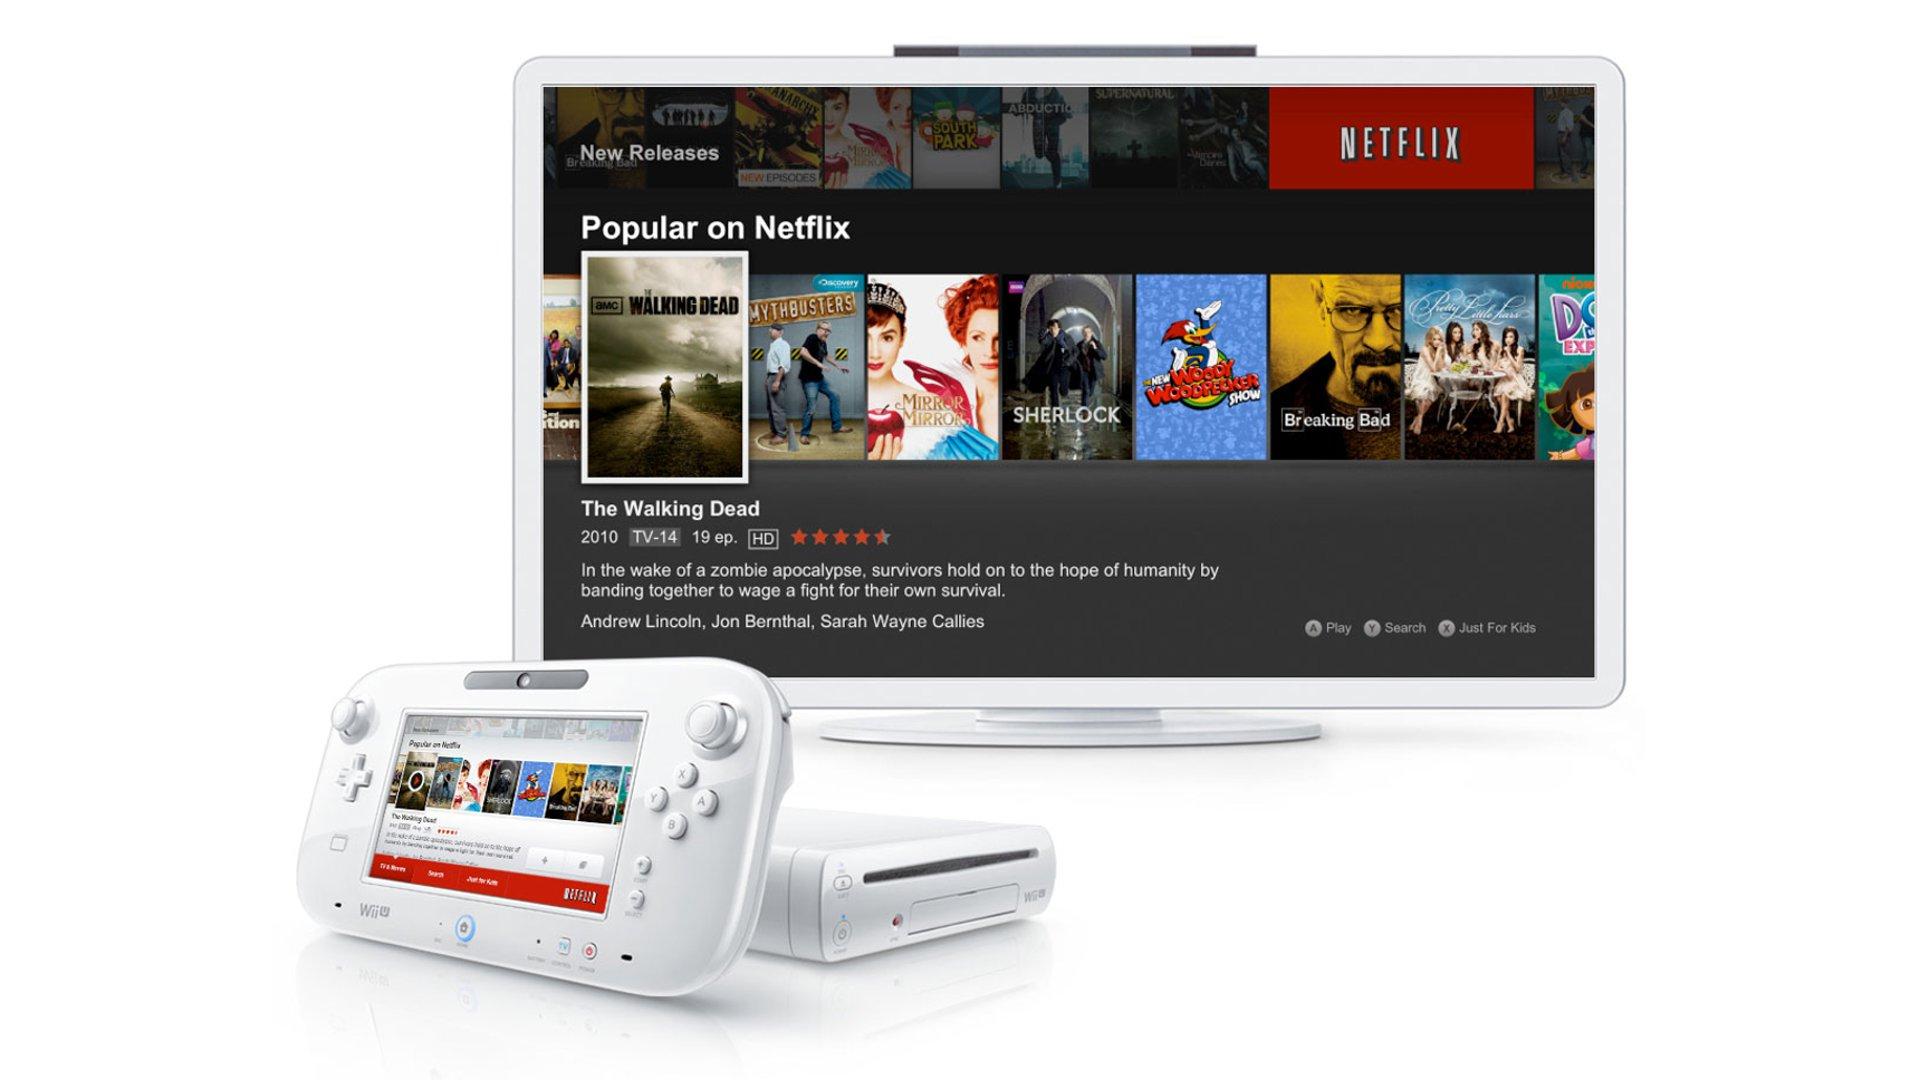 Netflix For Wii U